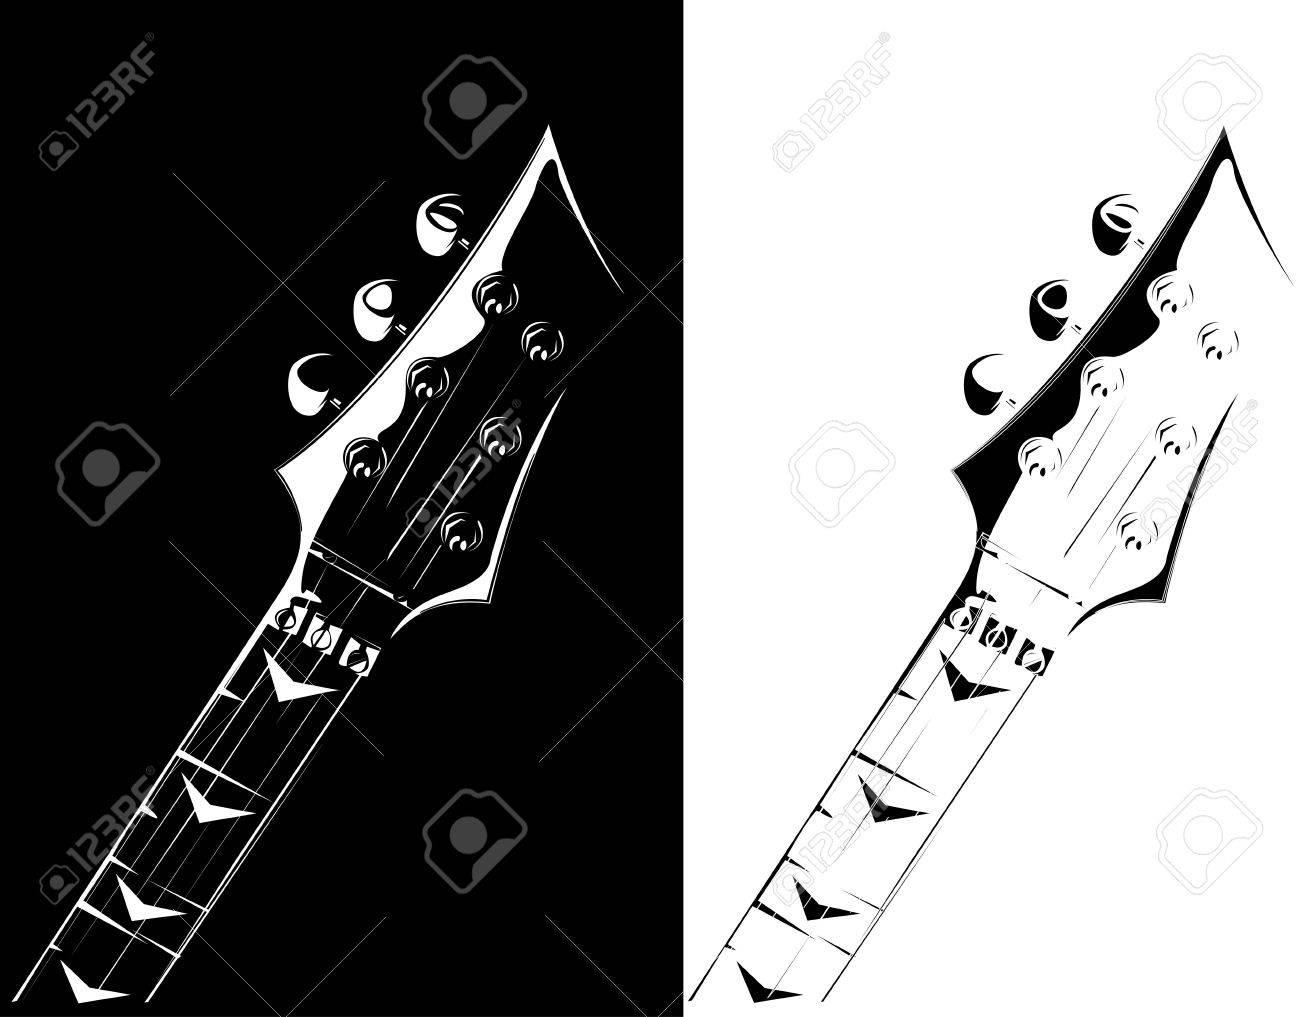 series. Electric guitar black-white version Stock Photo - 6586311